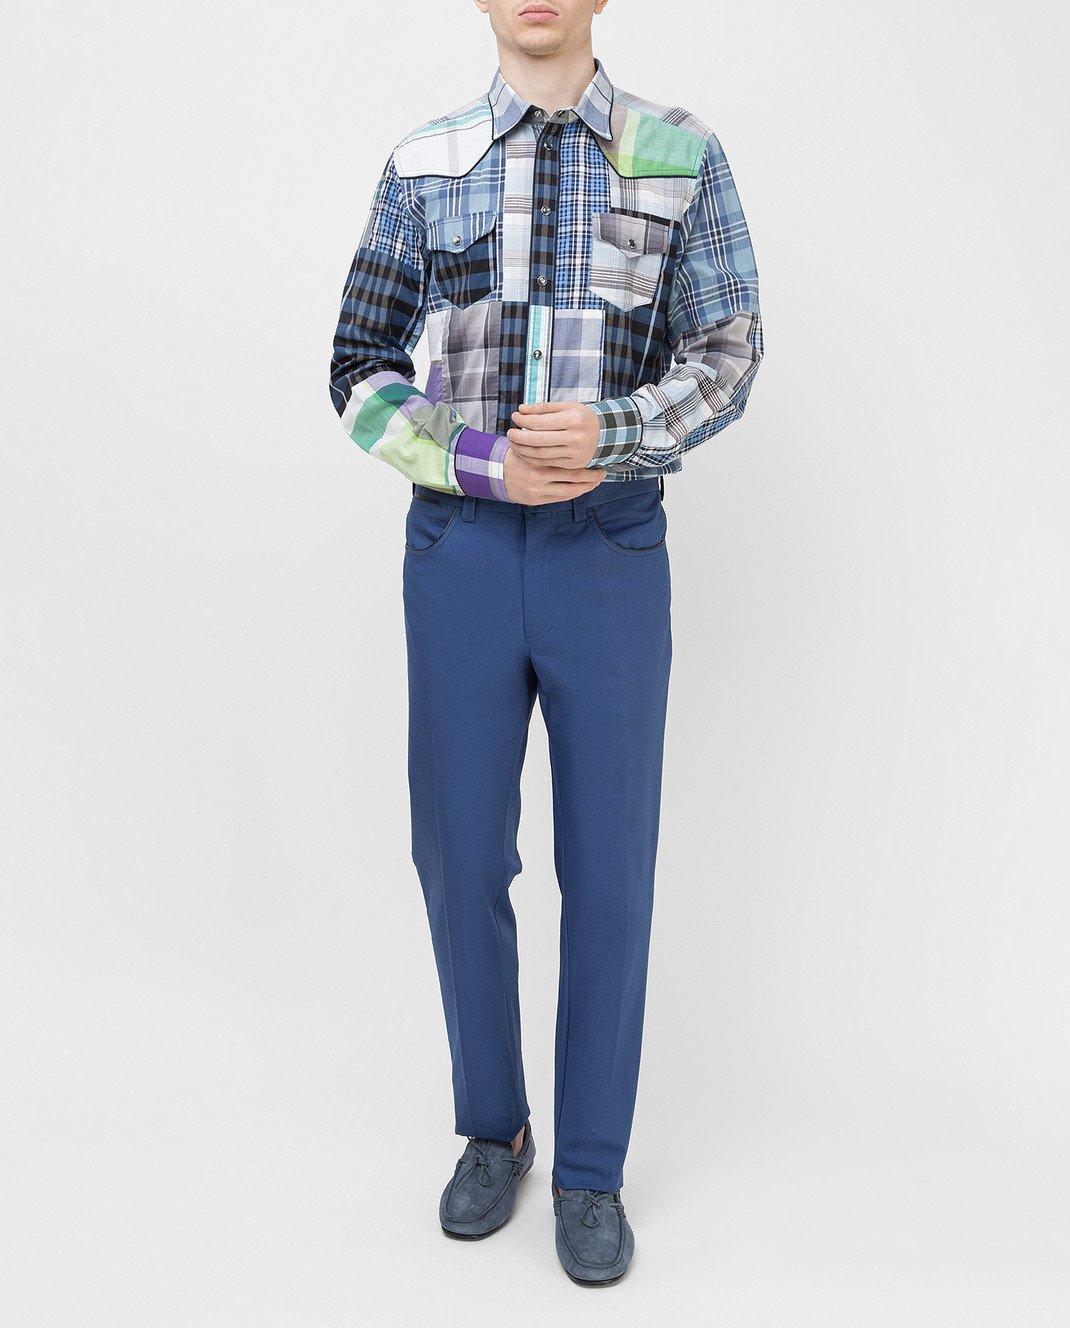 Dolce&Gabbana Синяя рубашка G5CS8TG9Y16 изображение 2